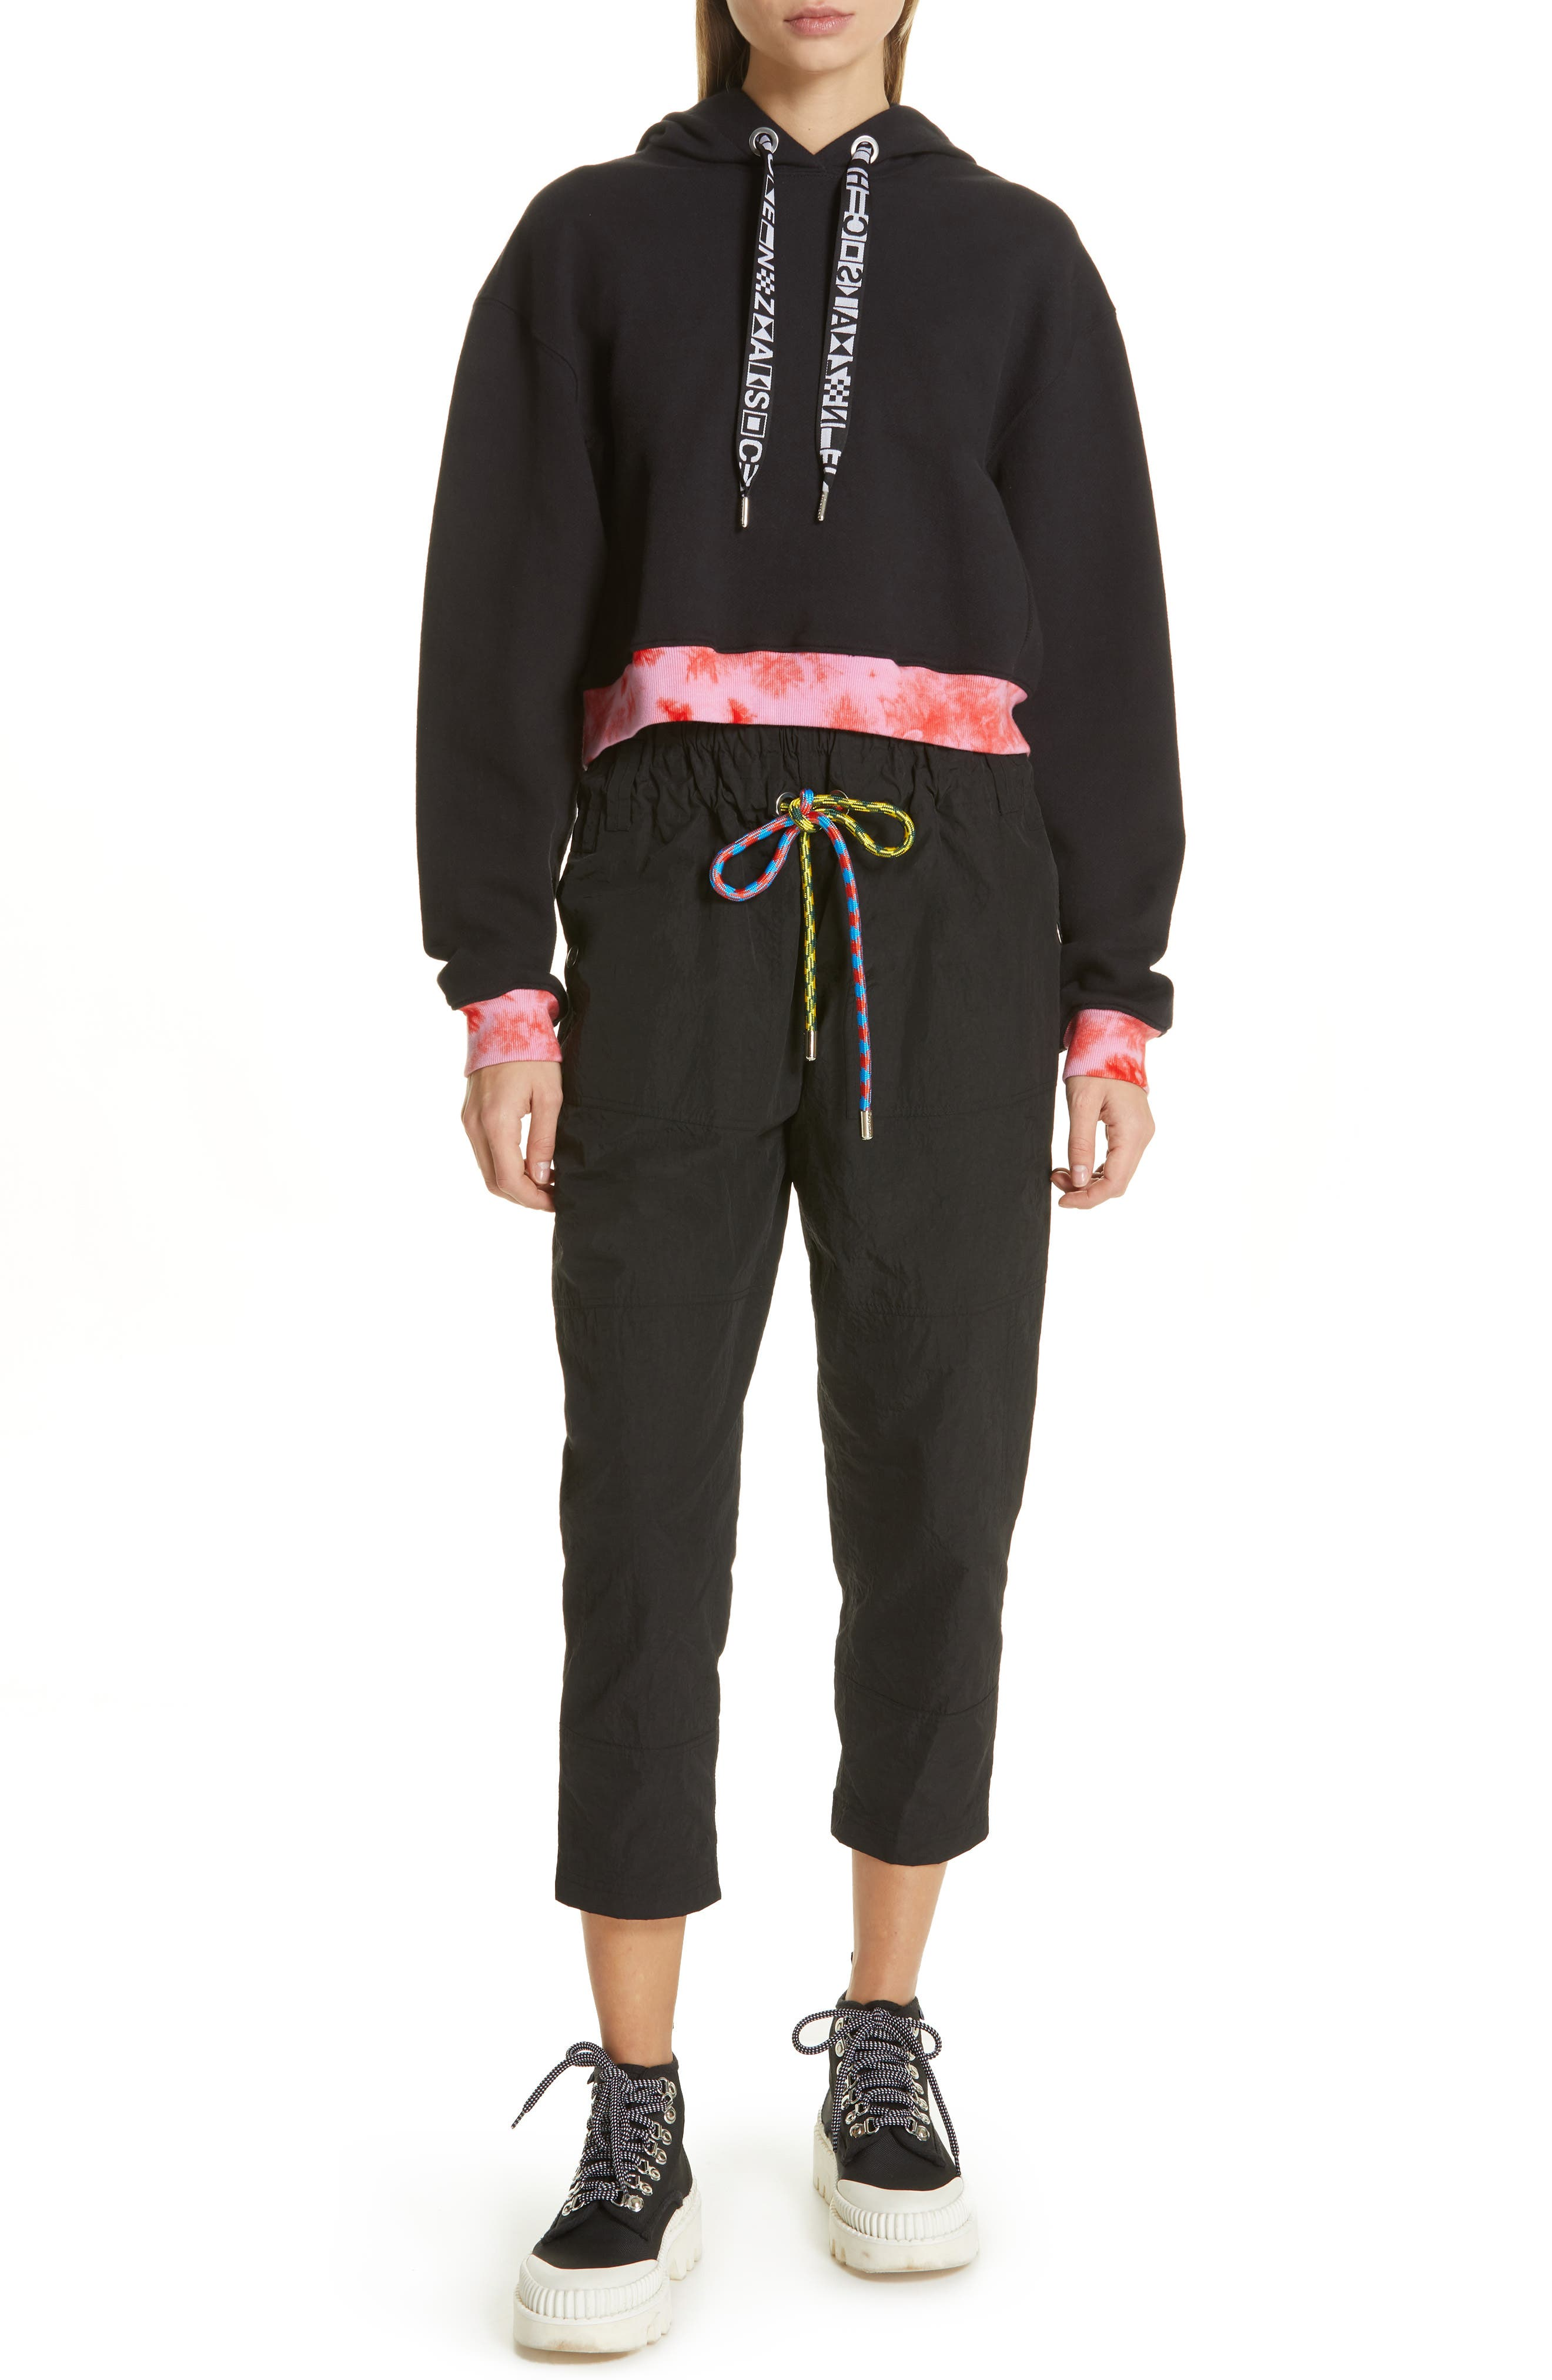 PROENZA SCHOULER, PSWL Drawstring Waist Parachute Pants, Alternate thumbnail 7, color, BLACK